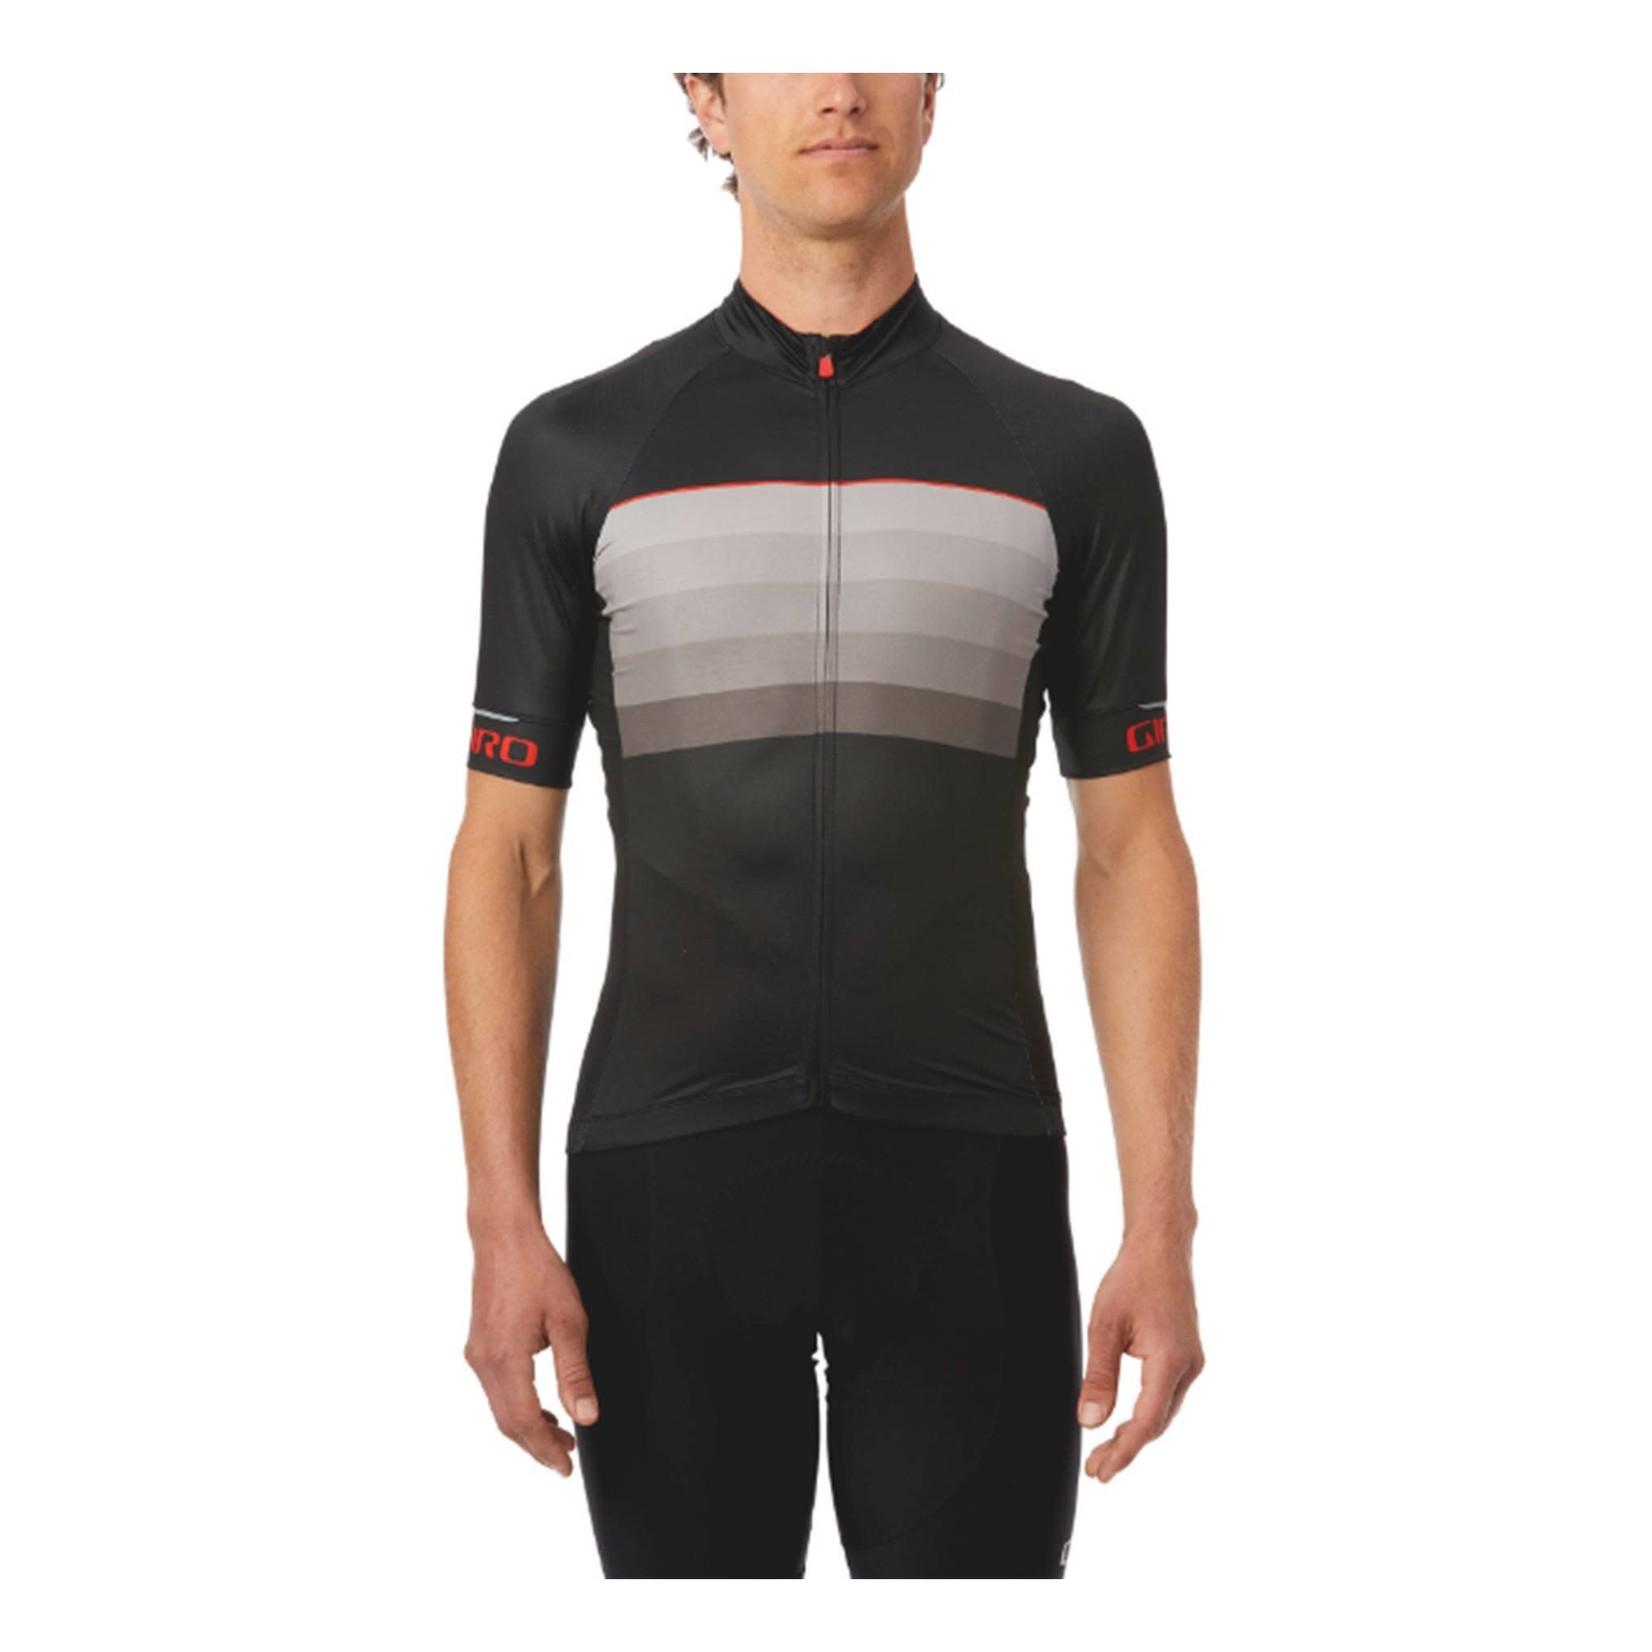 Giro Chrono Expert Cycling Jersey Black / Red Horizon